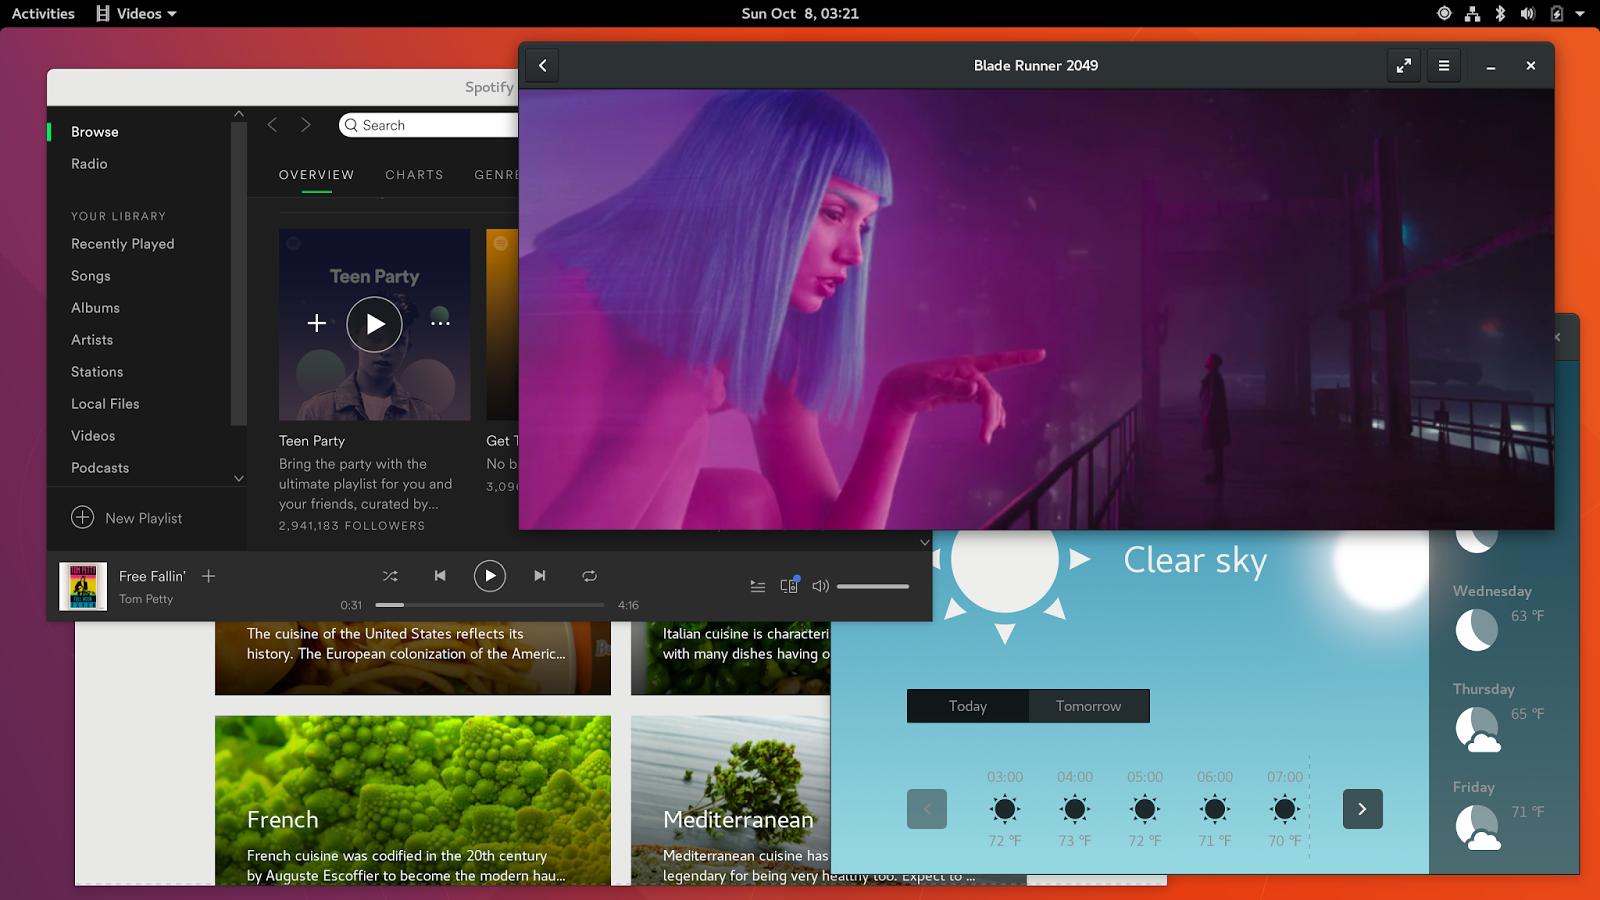 install spotify on ubuntu 17.10